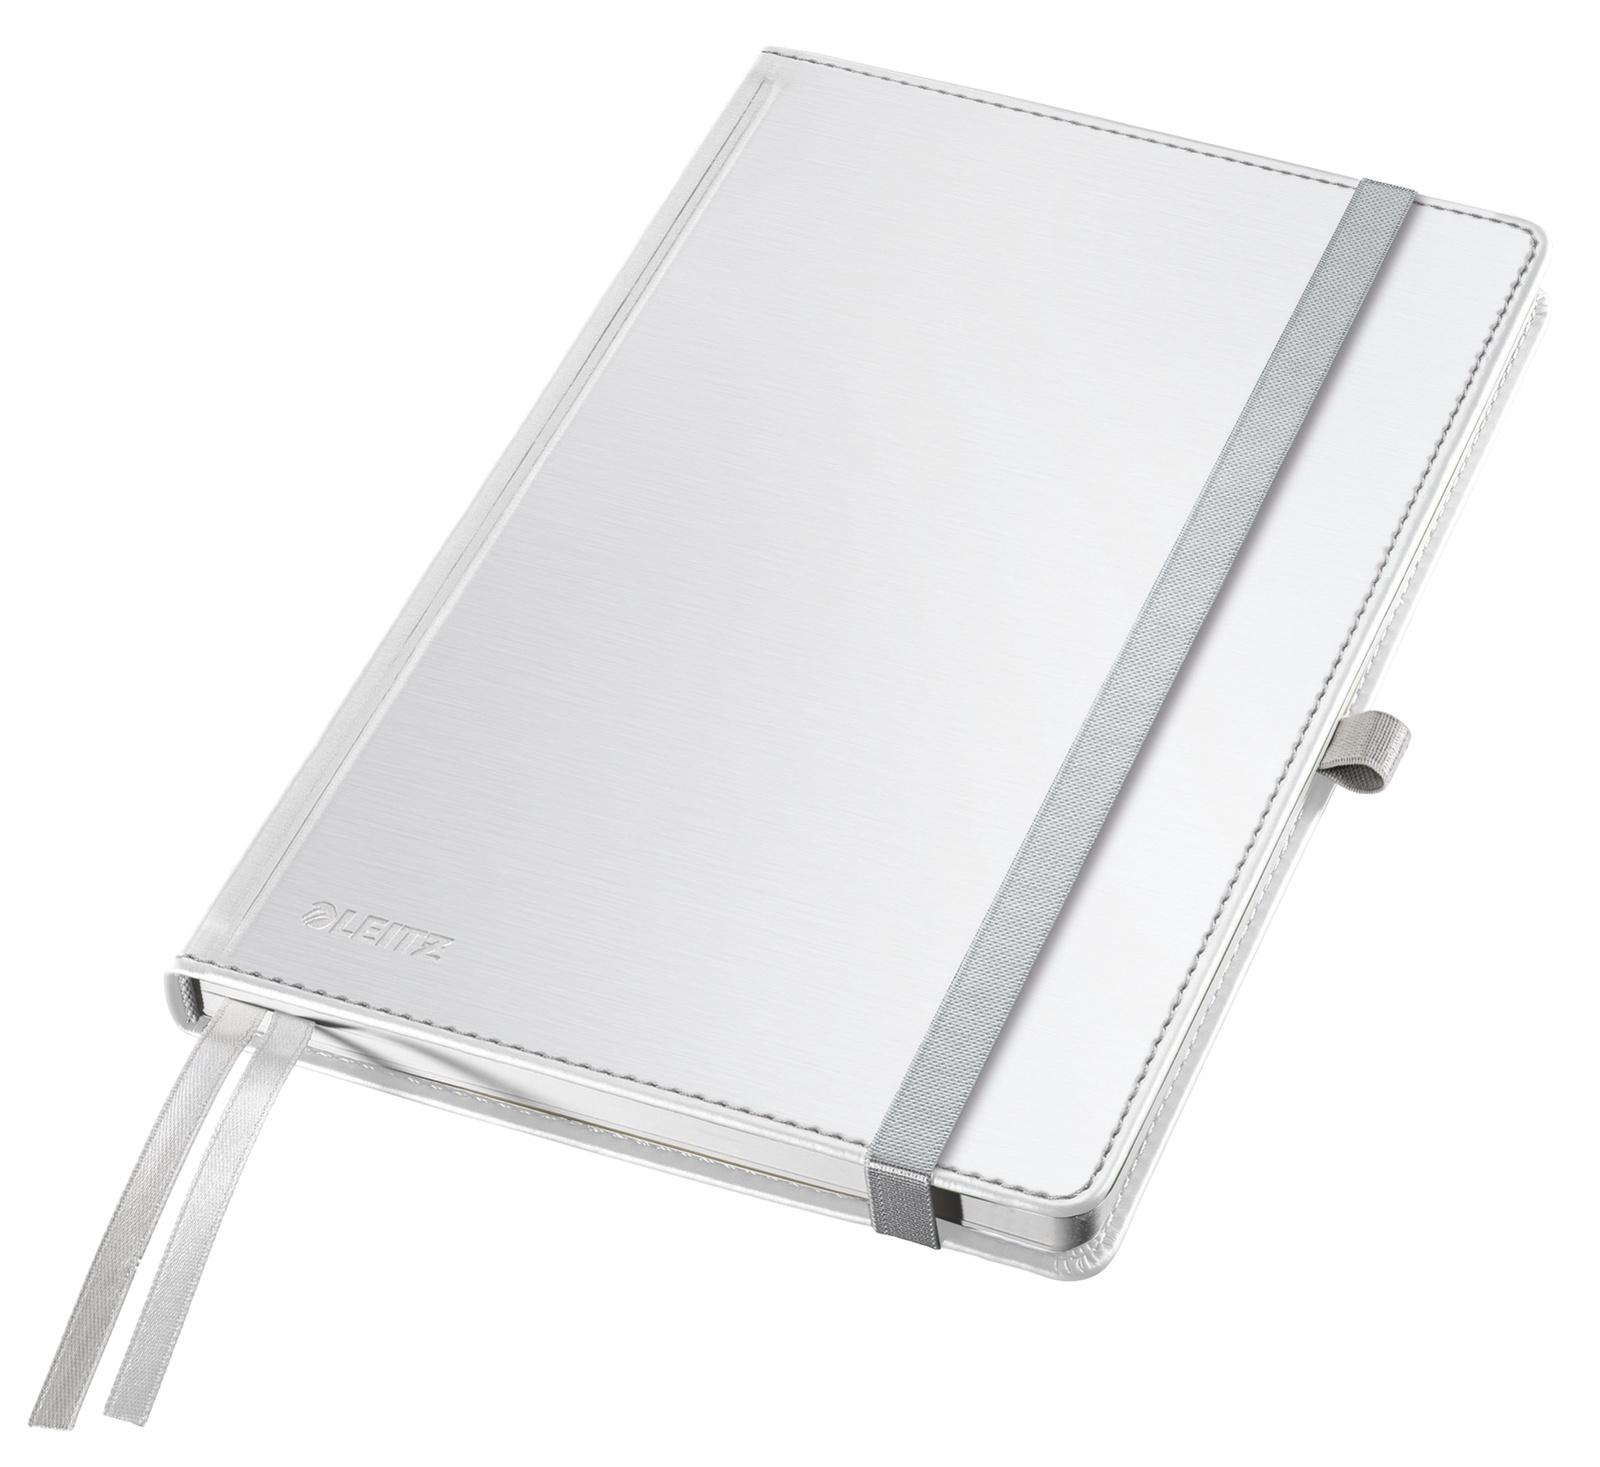 Записная книжка Leitz Записная книга Style, А5, клетка, белая сталь, 80